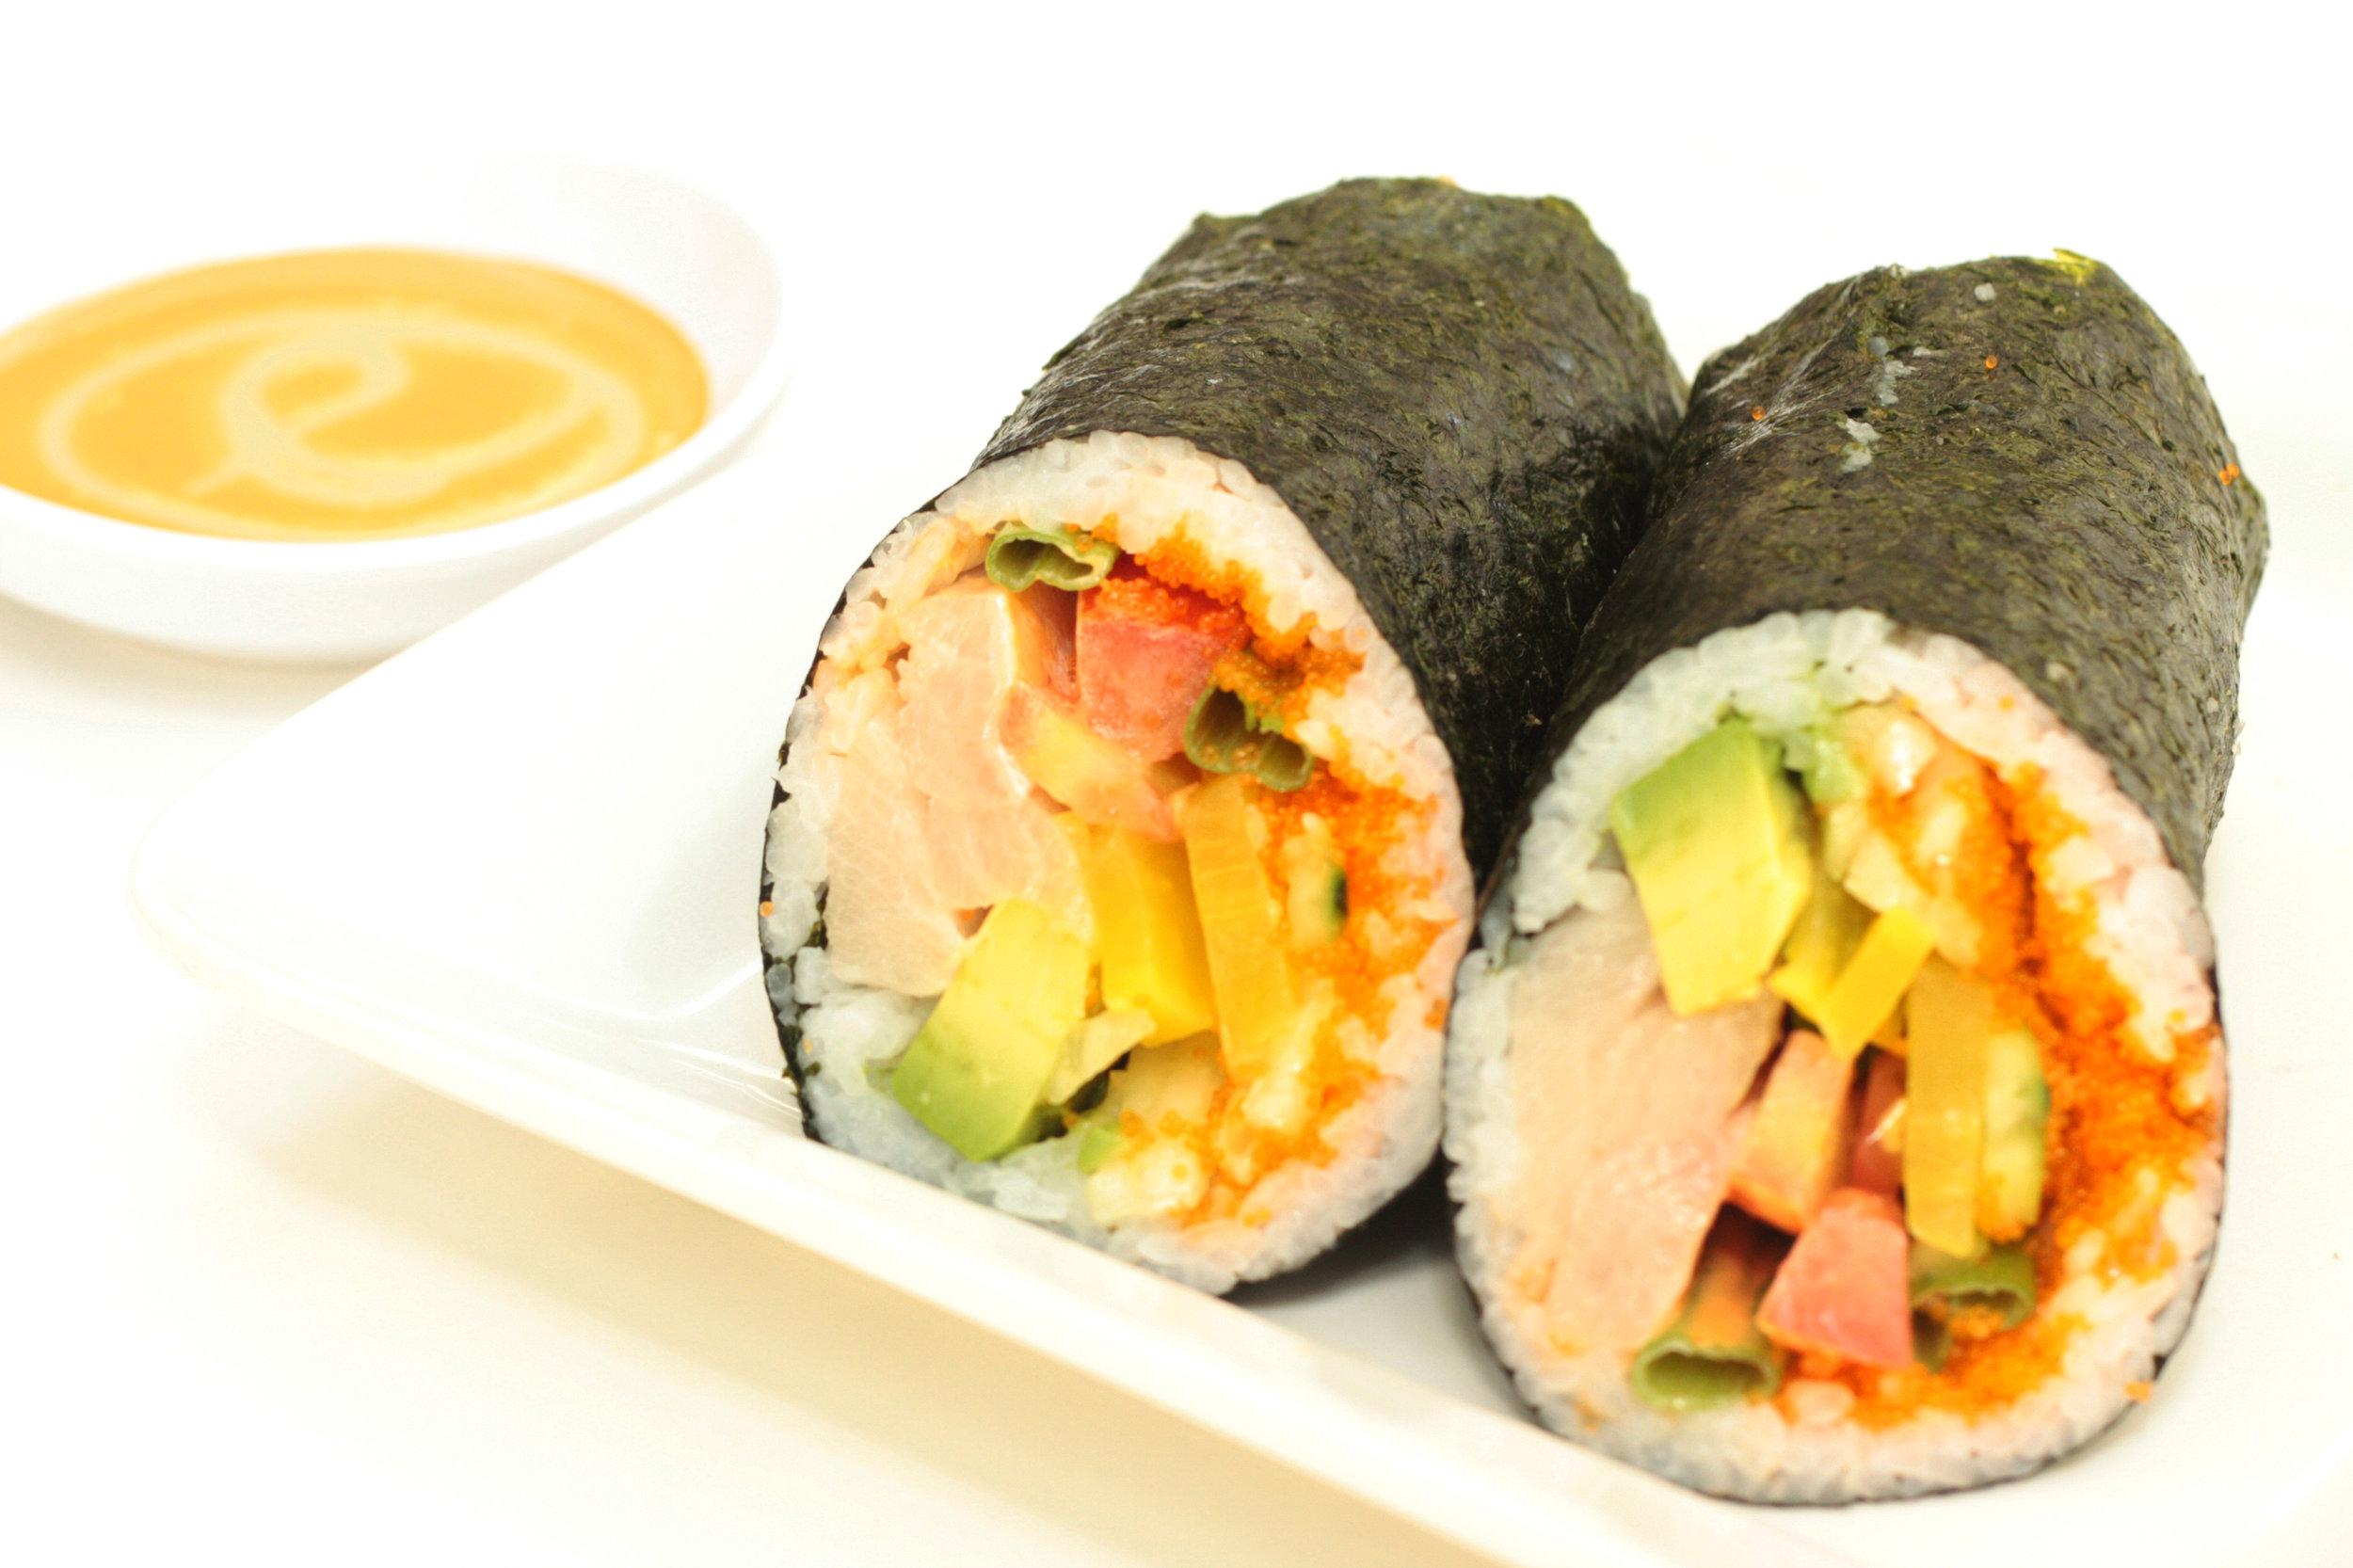 Hamachirrito_Sushi_Burrito_San_Francisco_Japanese_Restaurant_Kui_Shin_Bo.jpg